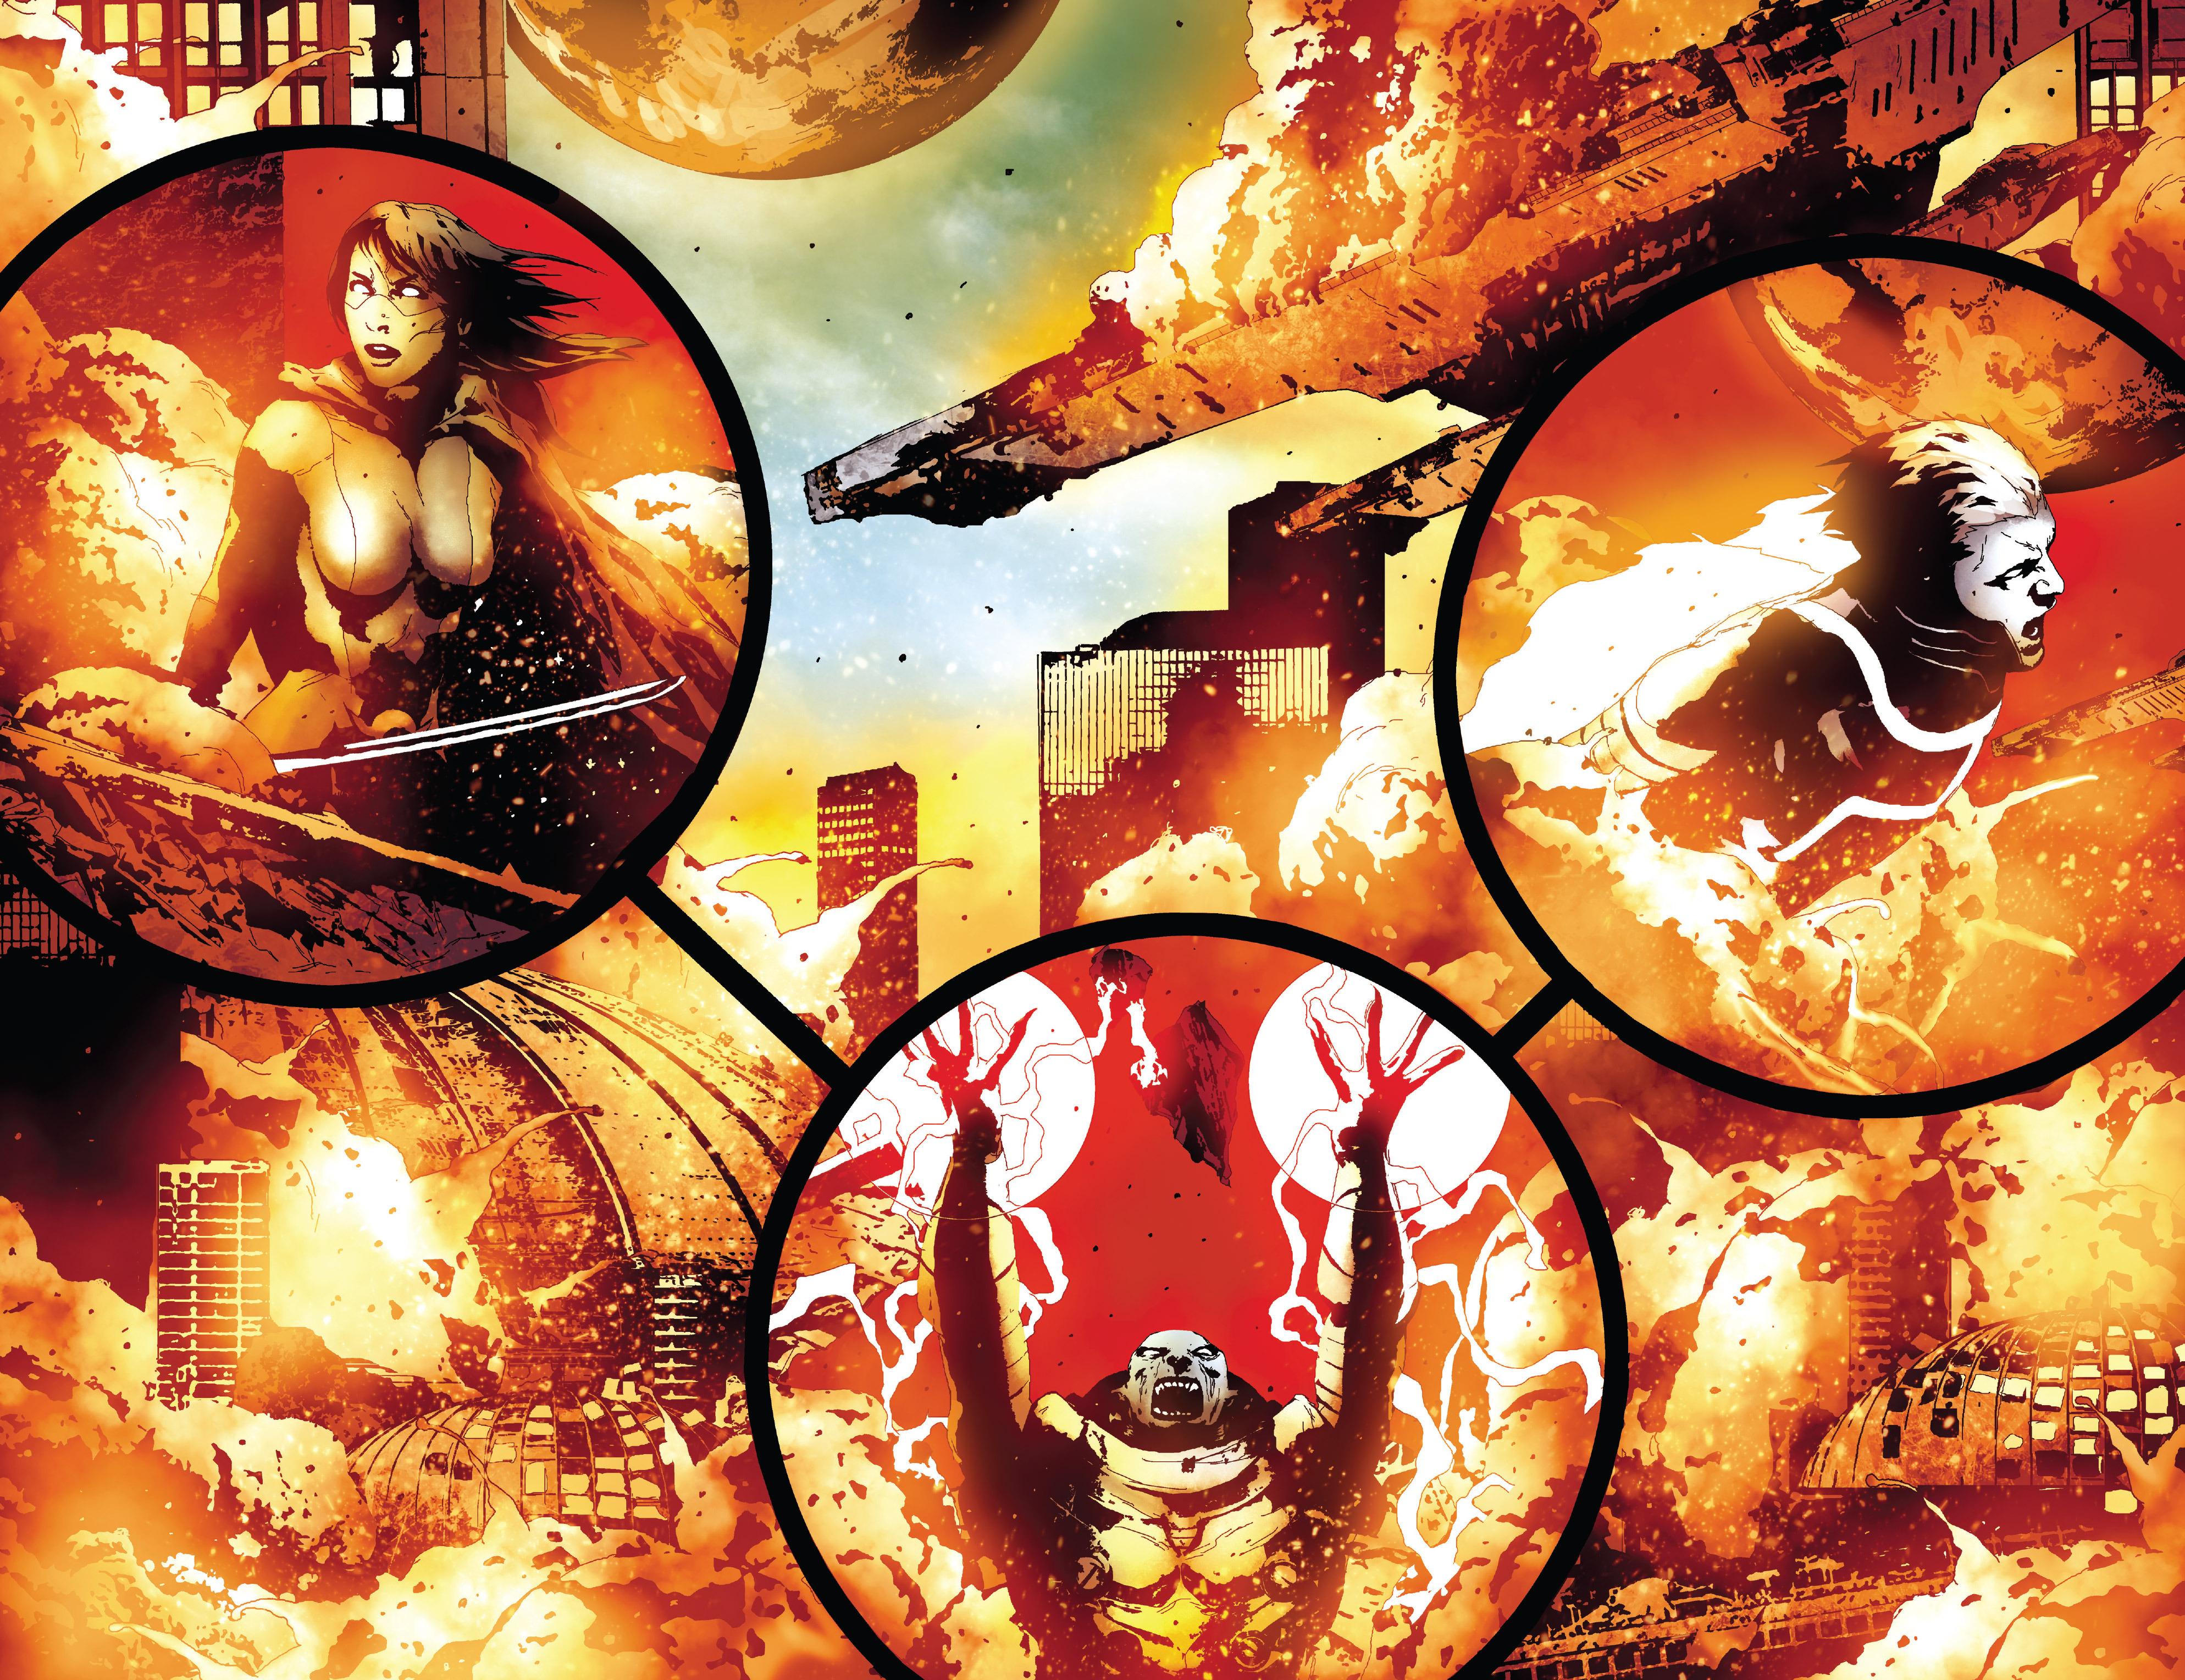 All-New X-Men (2013) chap 39 pic 11